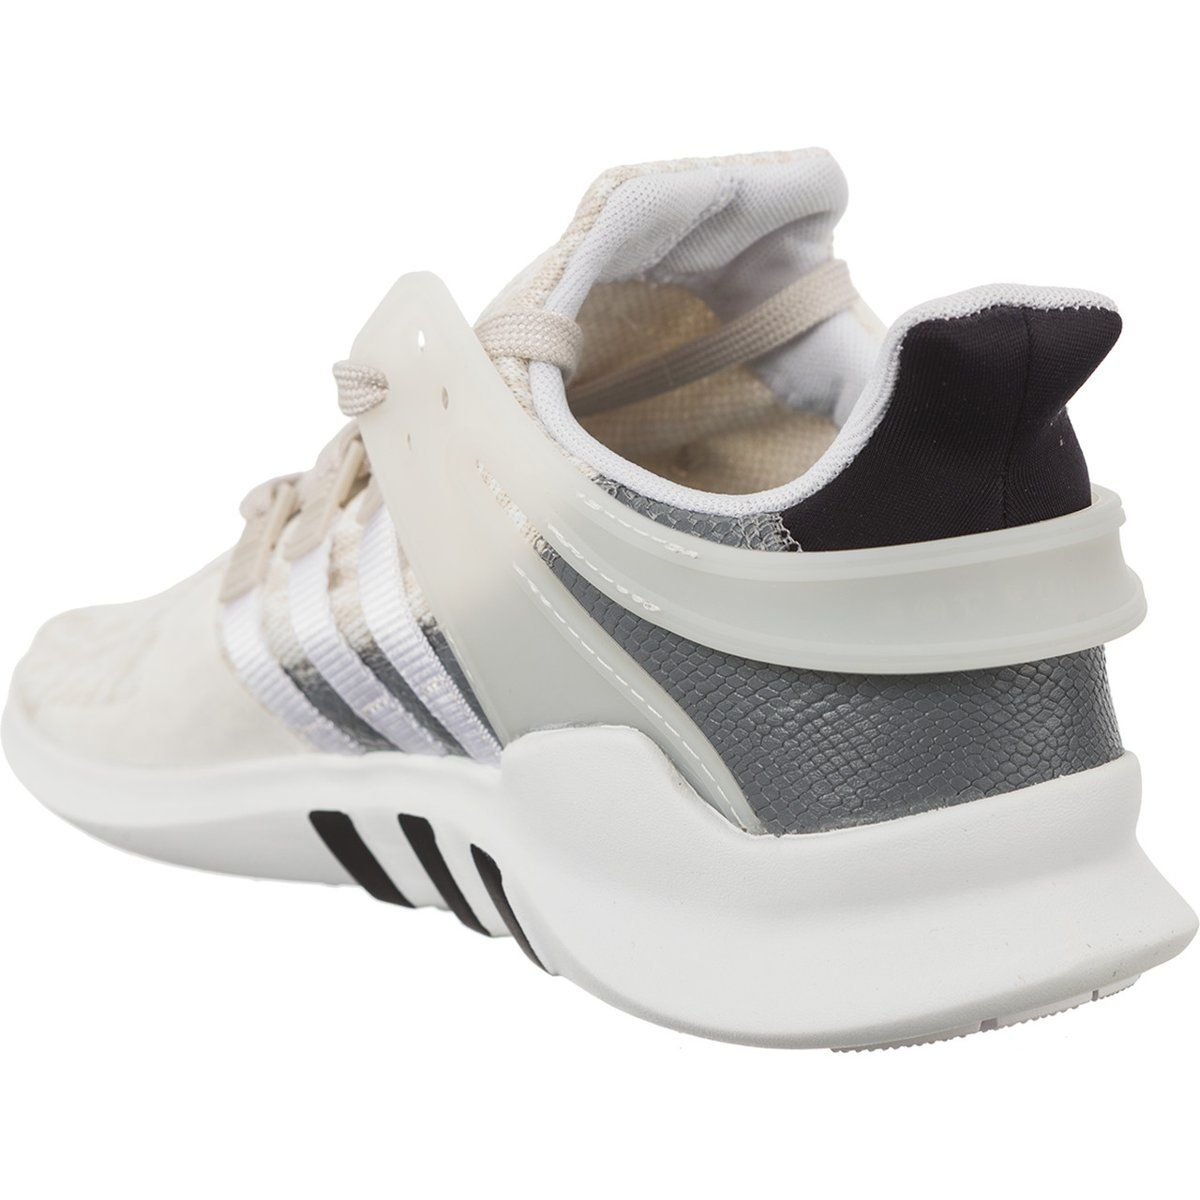 Sportowe Damskie Adidas Adidas Wielokolorowe Eqt Support Adv W 593 Adidas Superstar Sneaker Adidas Sneakers Adidas